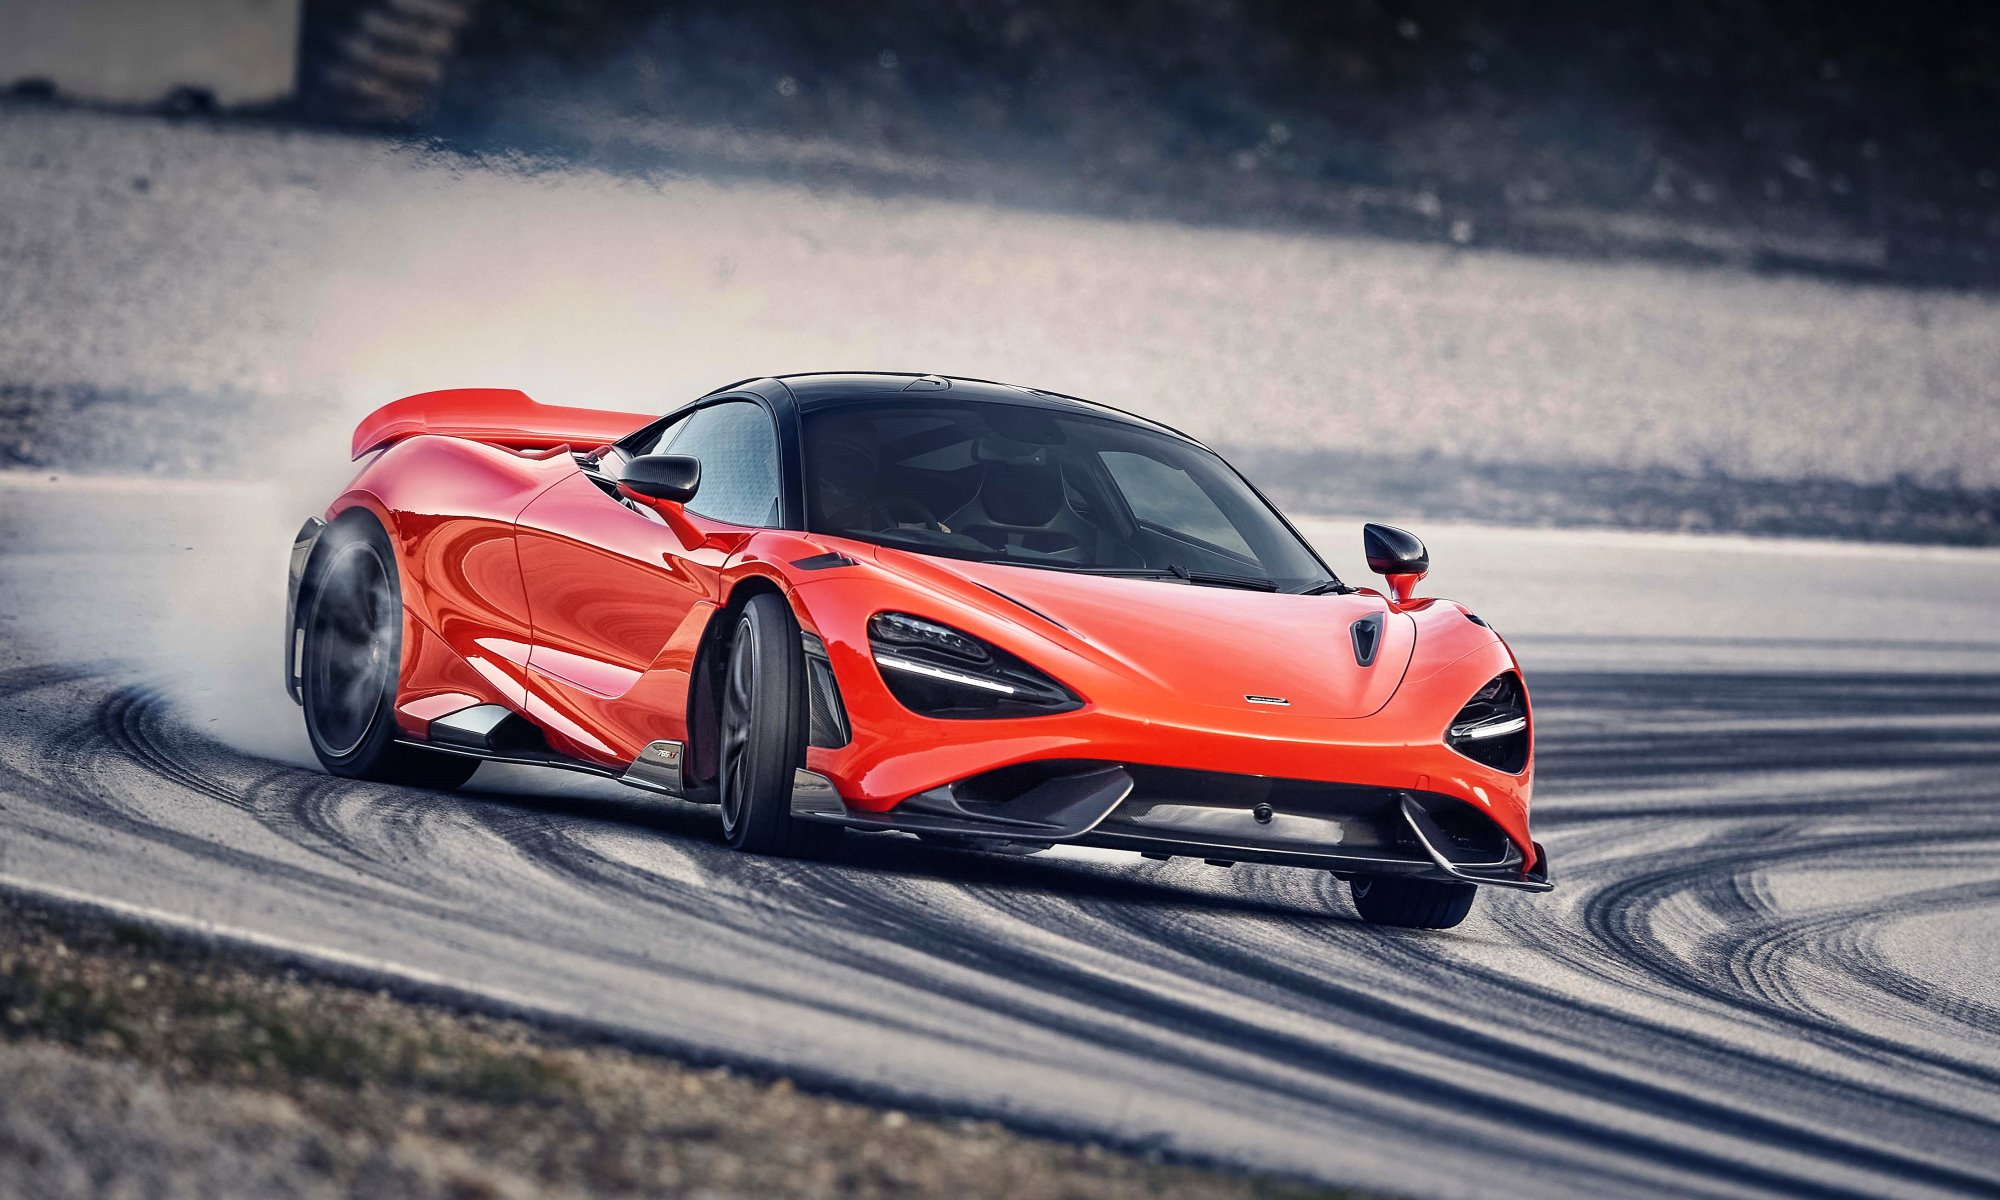 McLaren 765LT sideways